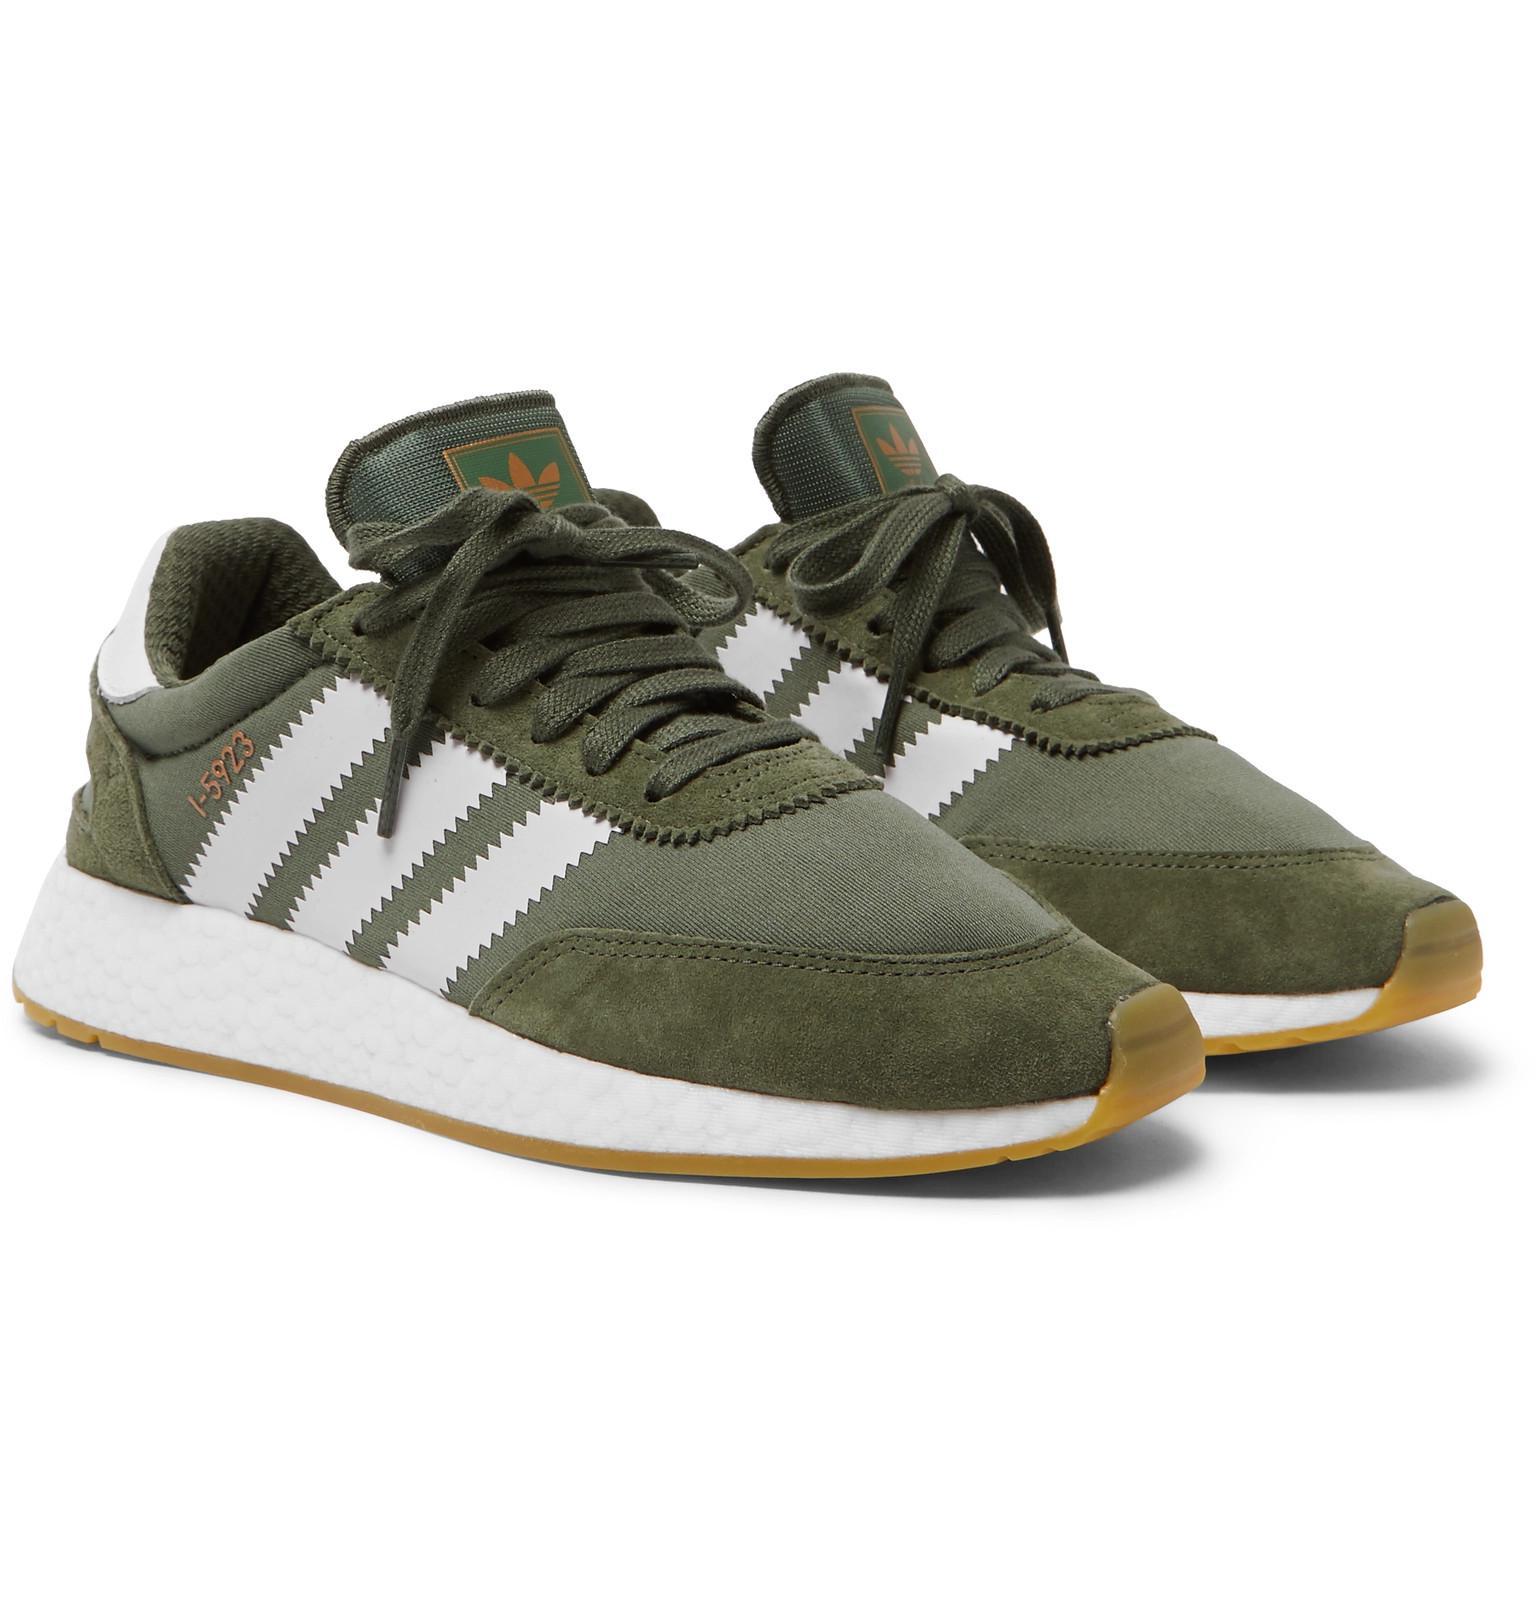 I-5923 Suede-trimmed Neoprene Sneakers adidas Originals iYlcJRl24w